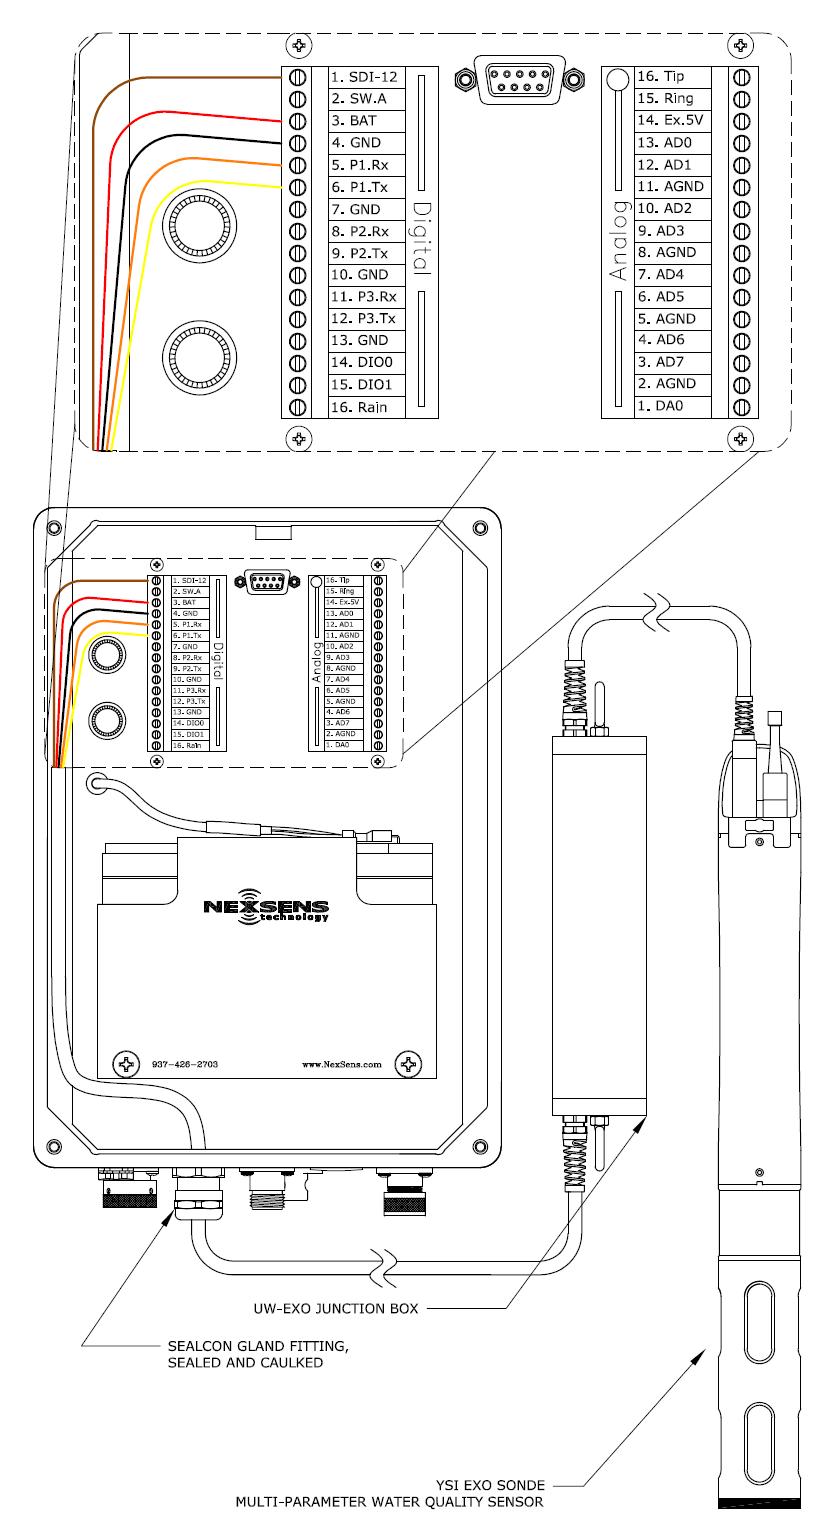 Vaisala Wxt520 in addition Arctic Cat Cooling System moreover Winegard Antenna Wiring Diagram further 70838 Mjerenje Okretaja Motora additionally Sterling Truck Radio Wiring Diagrams. on sdi wiring diagram